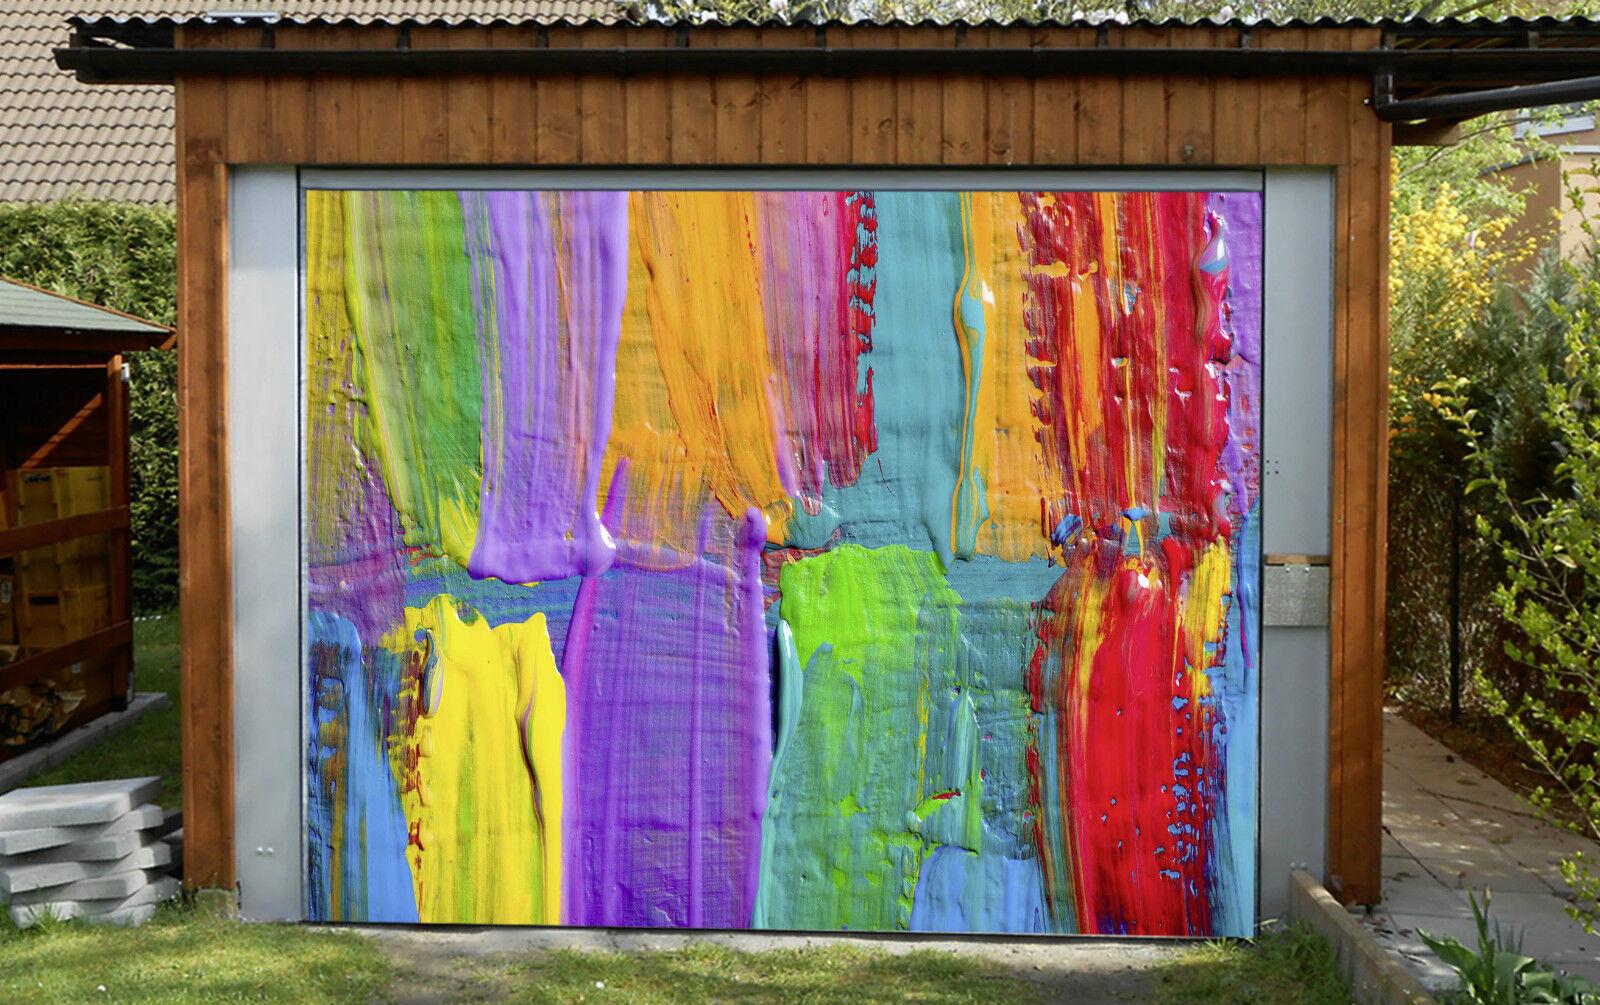 3D Farbee Pittura Garage Porta Stampe Parete Decorazione Murale AJ WALLPAPER IT